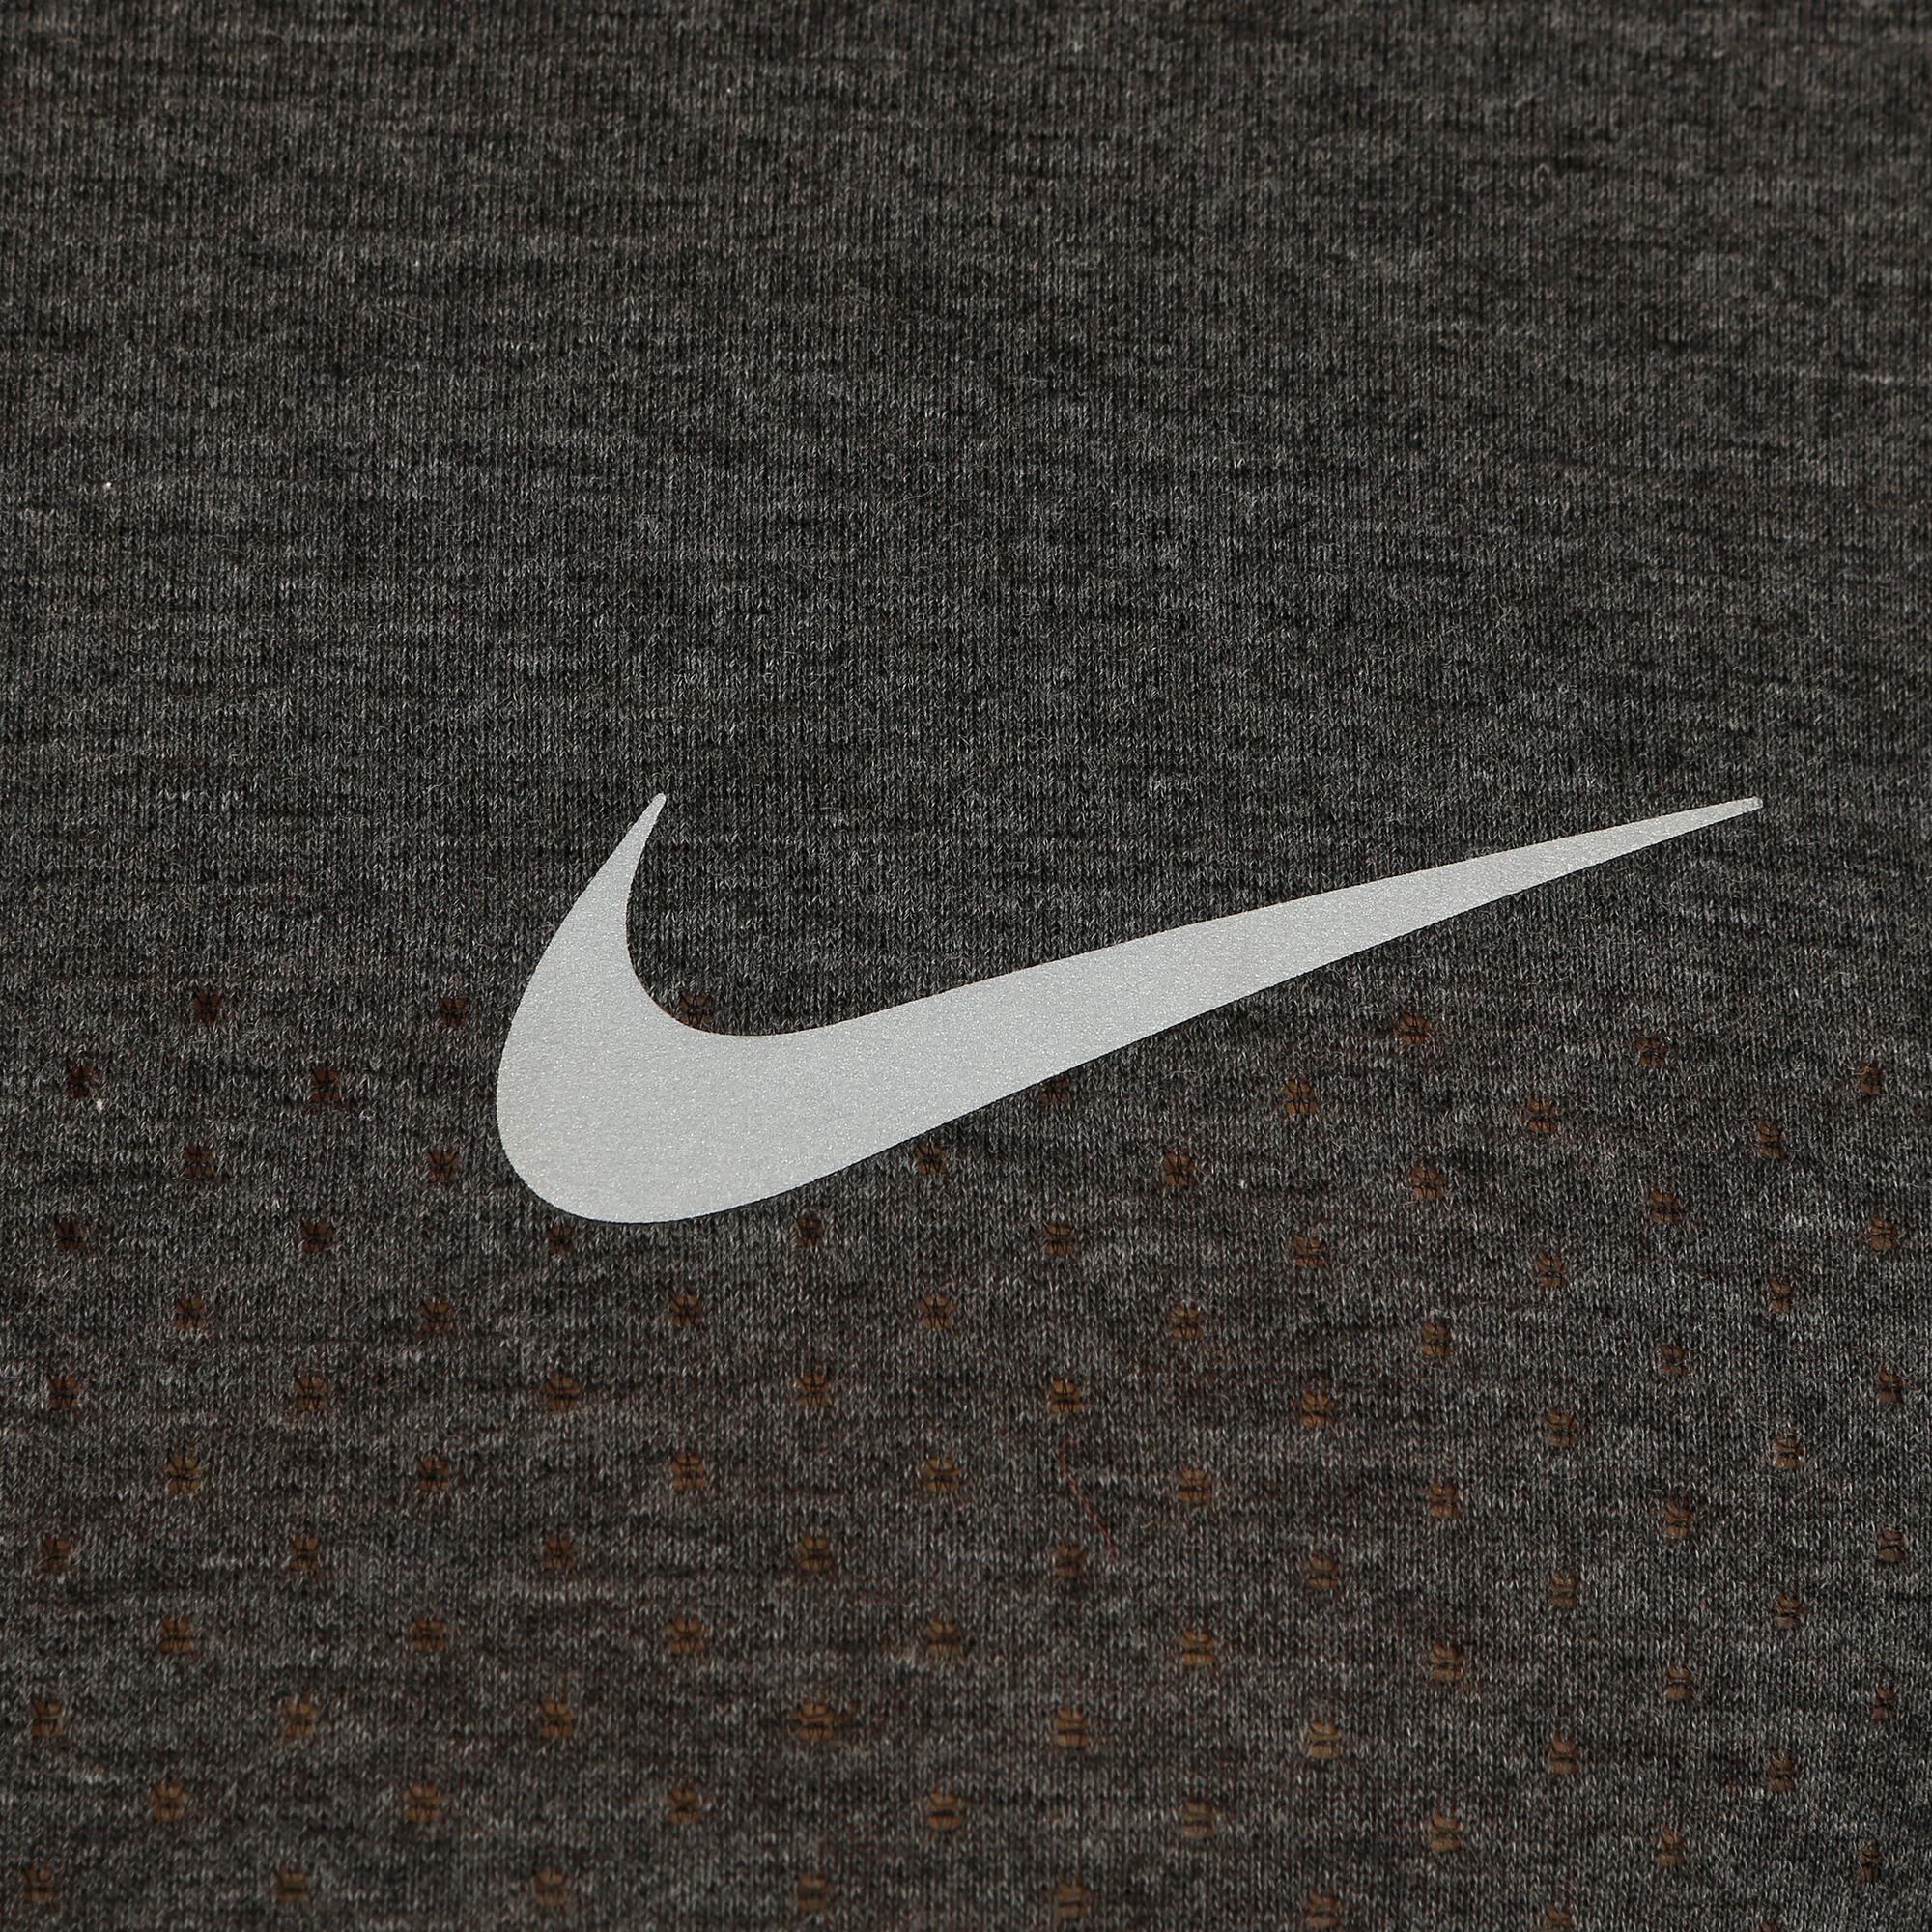 e357f015cfa7 buy Nike Breathe Tailwind CLV T-Shirt Men - Dark Grey